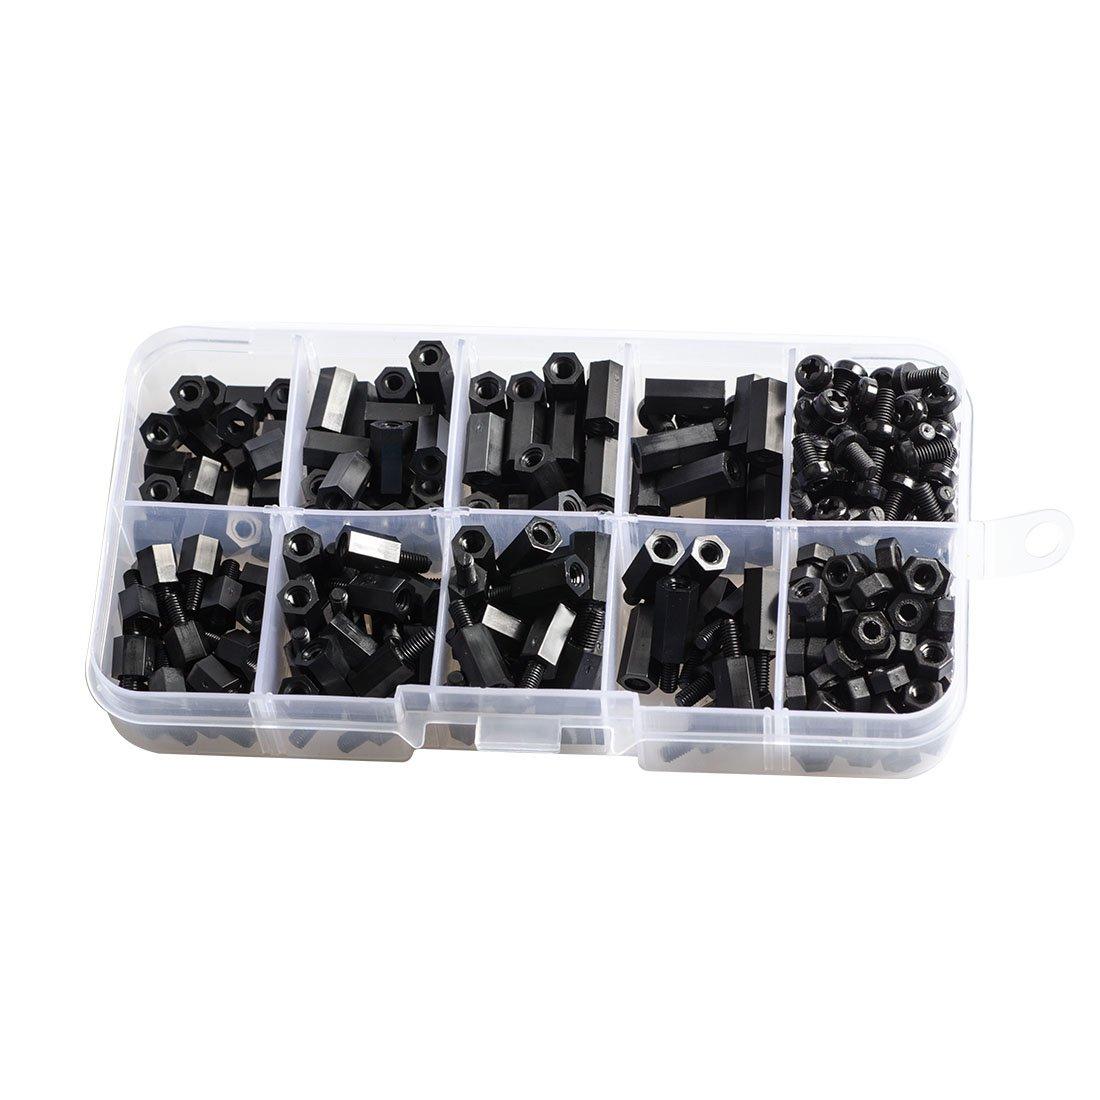 Wolfwhoop 300PCS M3 Nylon Black Hex Screw Nut Spacer Standoff Varied Length Assortment Box